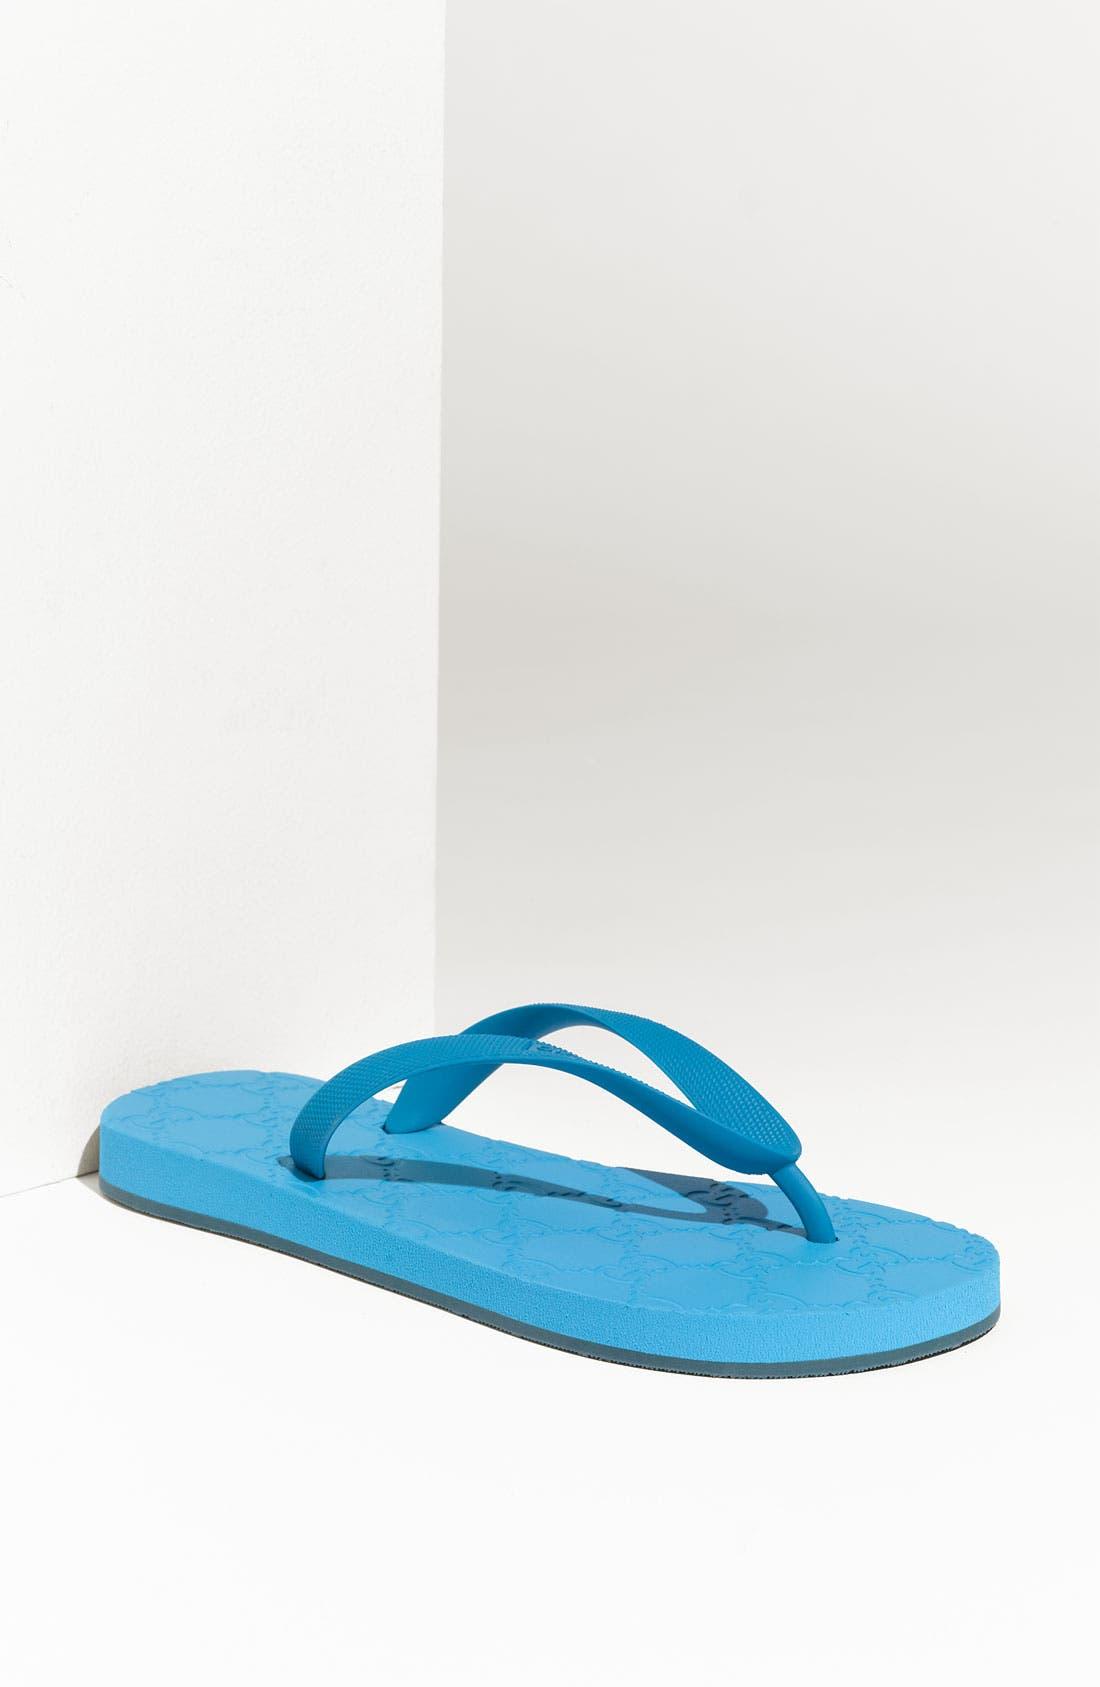 Main Image - Gucci 'Beldam' Sandal